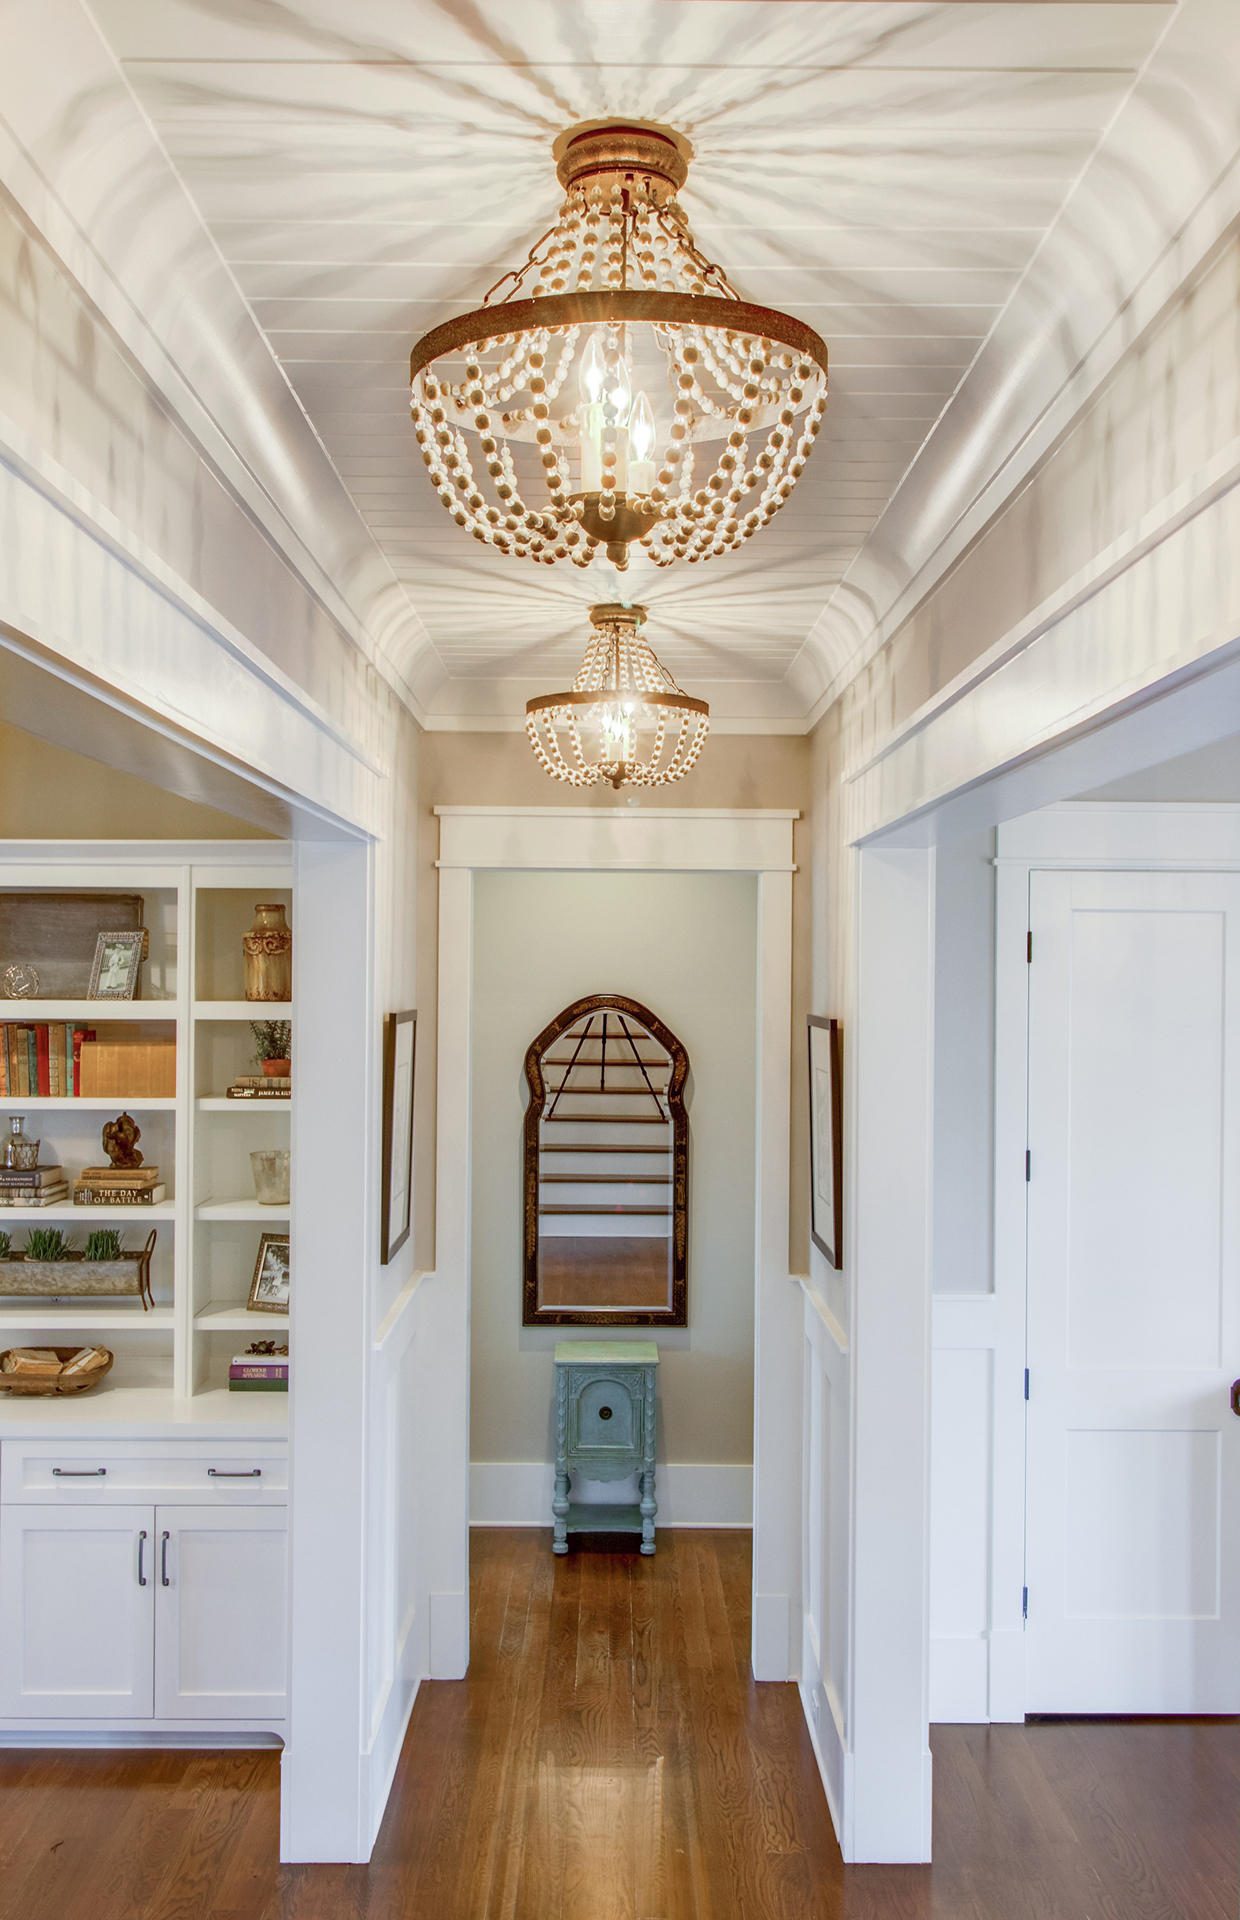 Daniel Island Park Homes For Sale - 117 Brailsford, Charleston, SC - 74